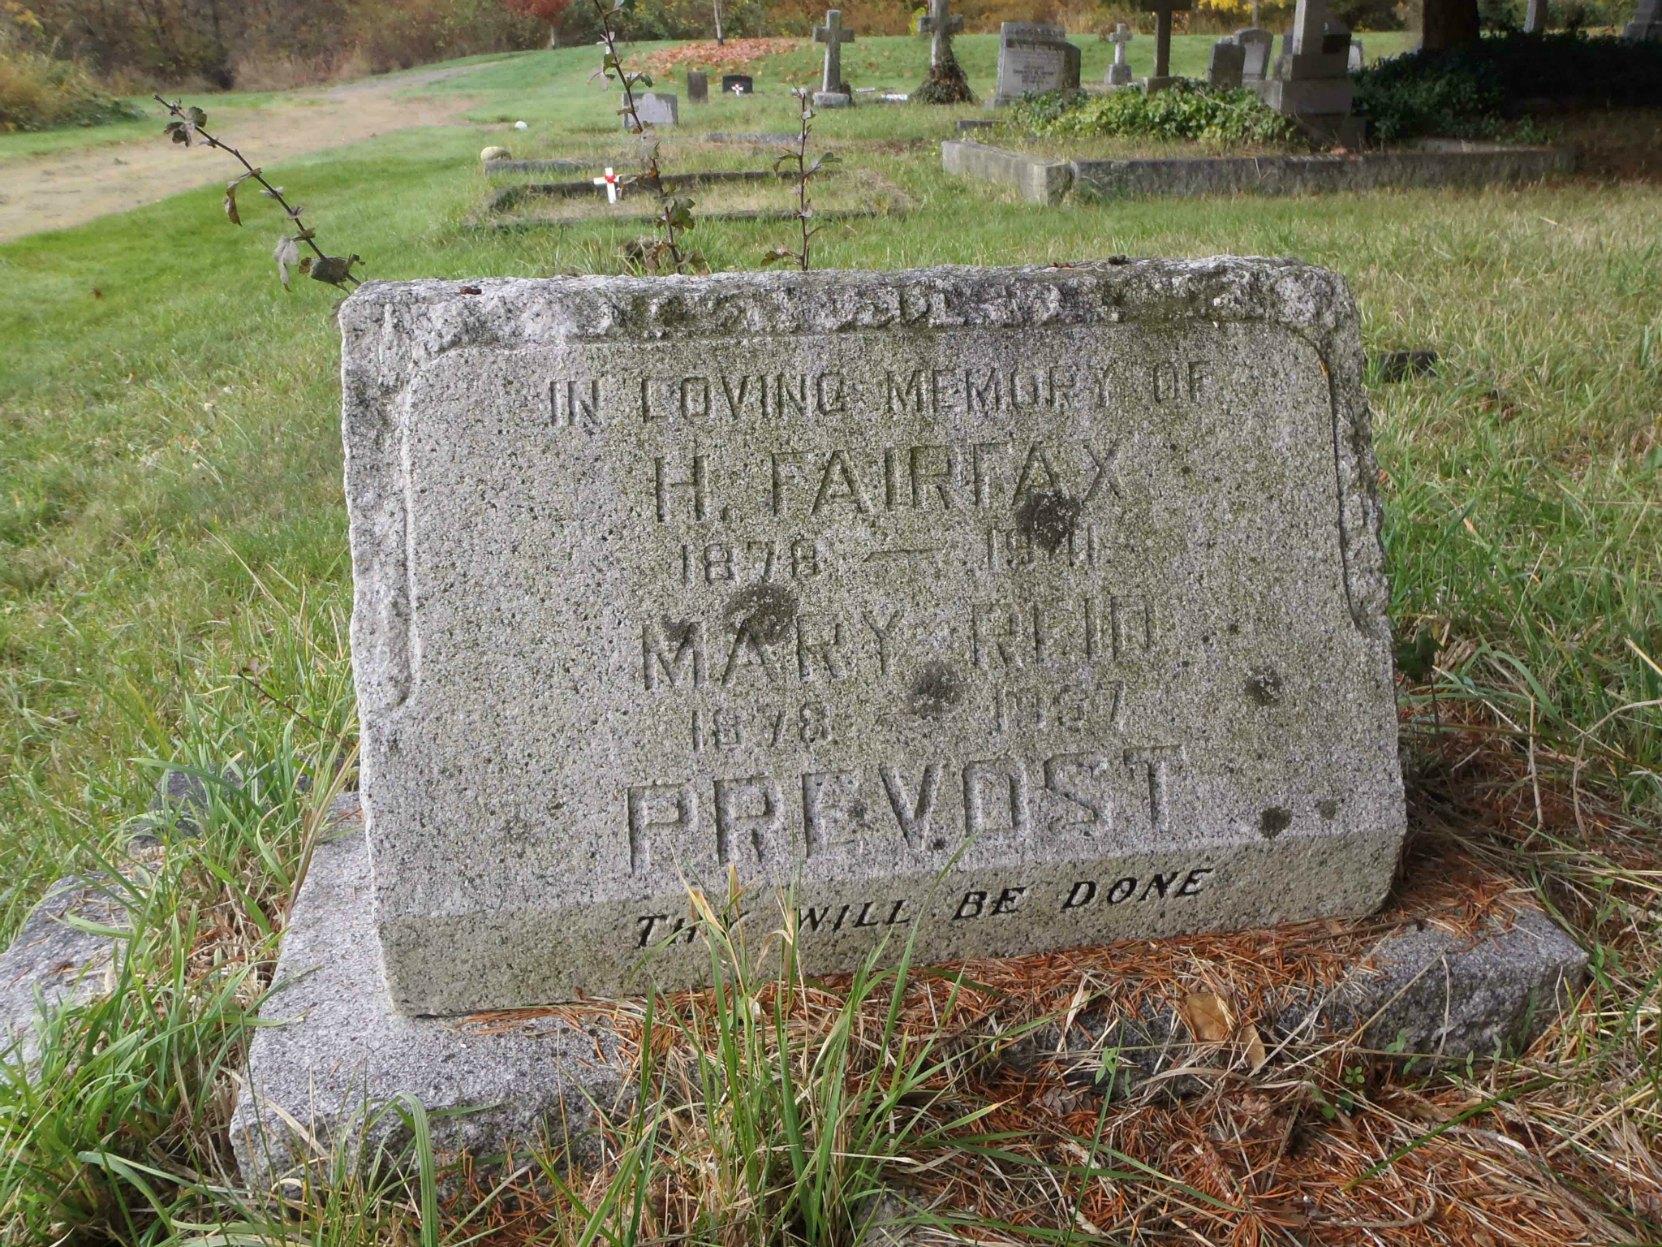 Harold Fairfax Prevost grave stone, St. Peter's Quamichan Anglican cemetery